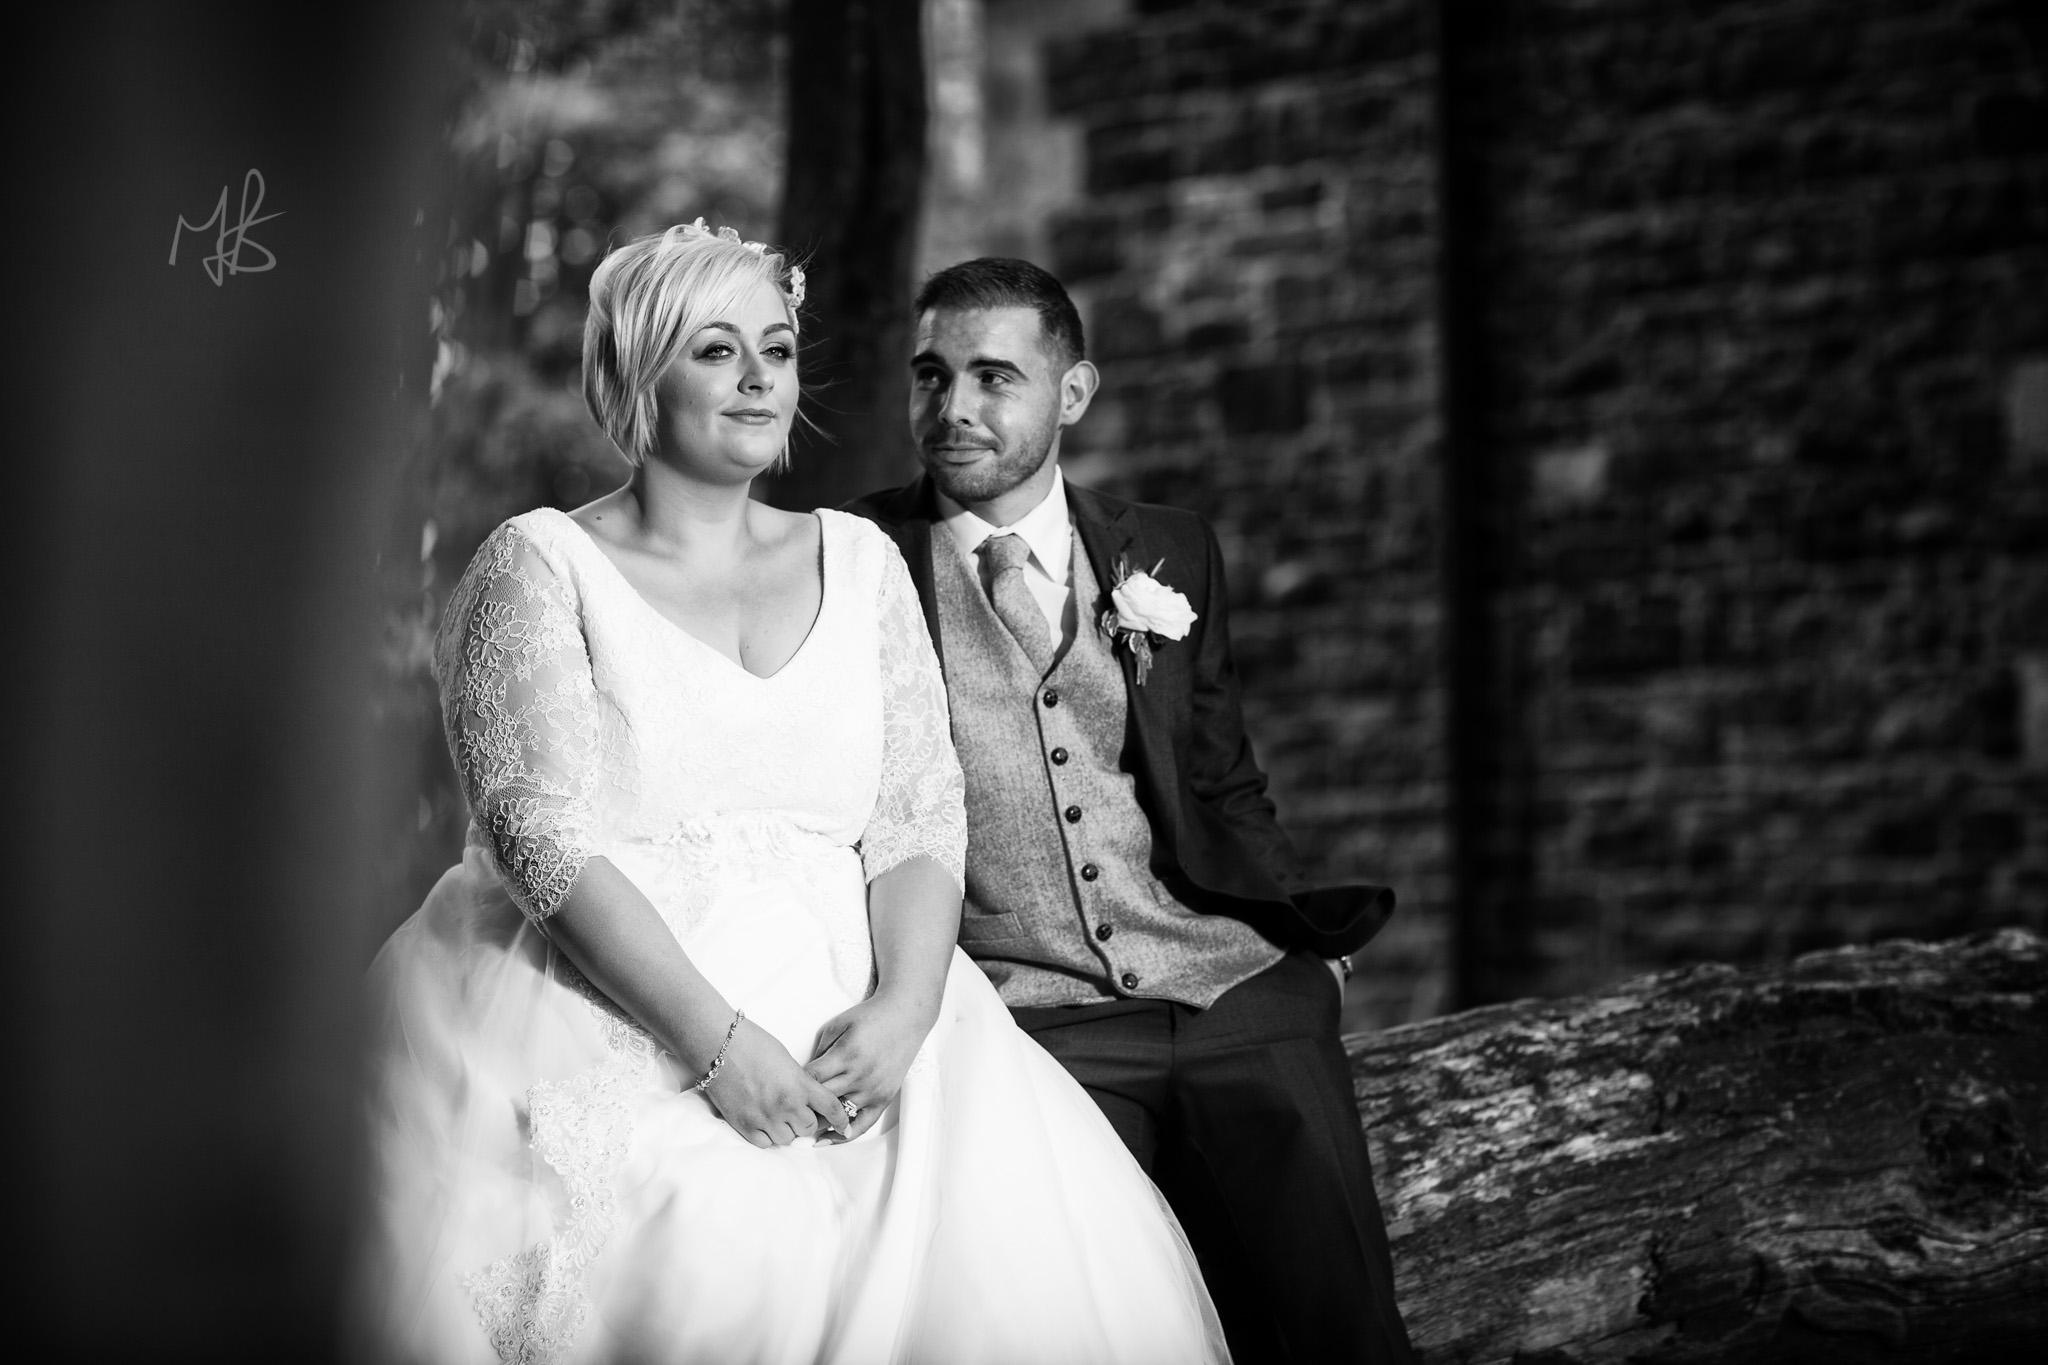 Northern-Ireland-Wedding-Photographer-Mark-Barnes-Ballymena_wedding-photography-Leighinmohr-House-Seamas_Alanna_For-web-34.jpg